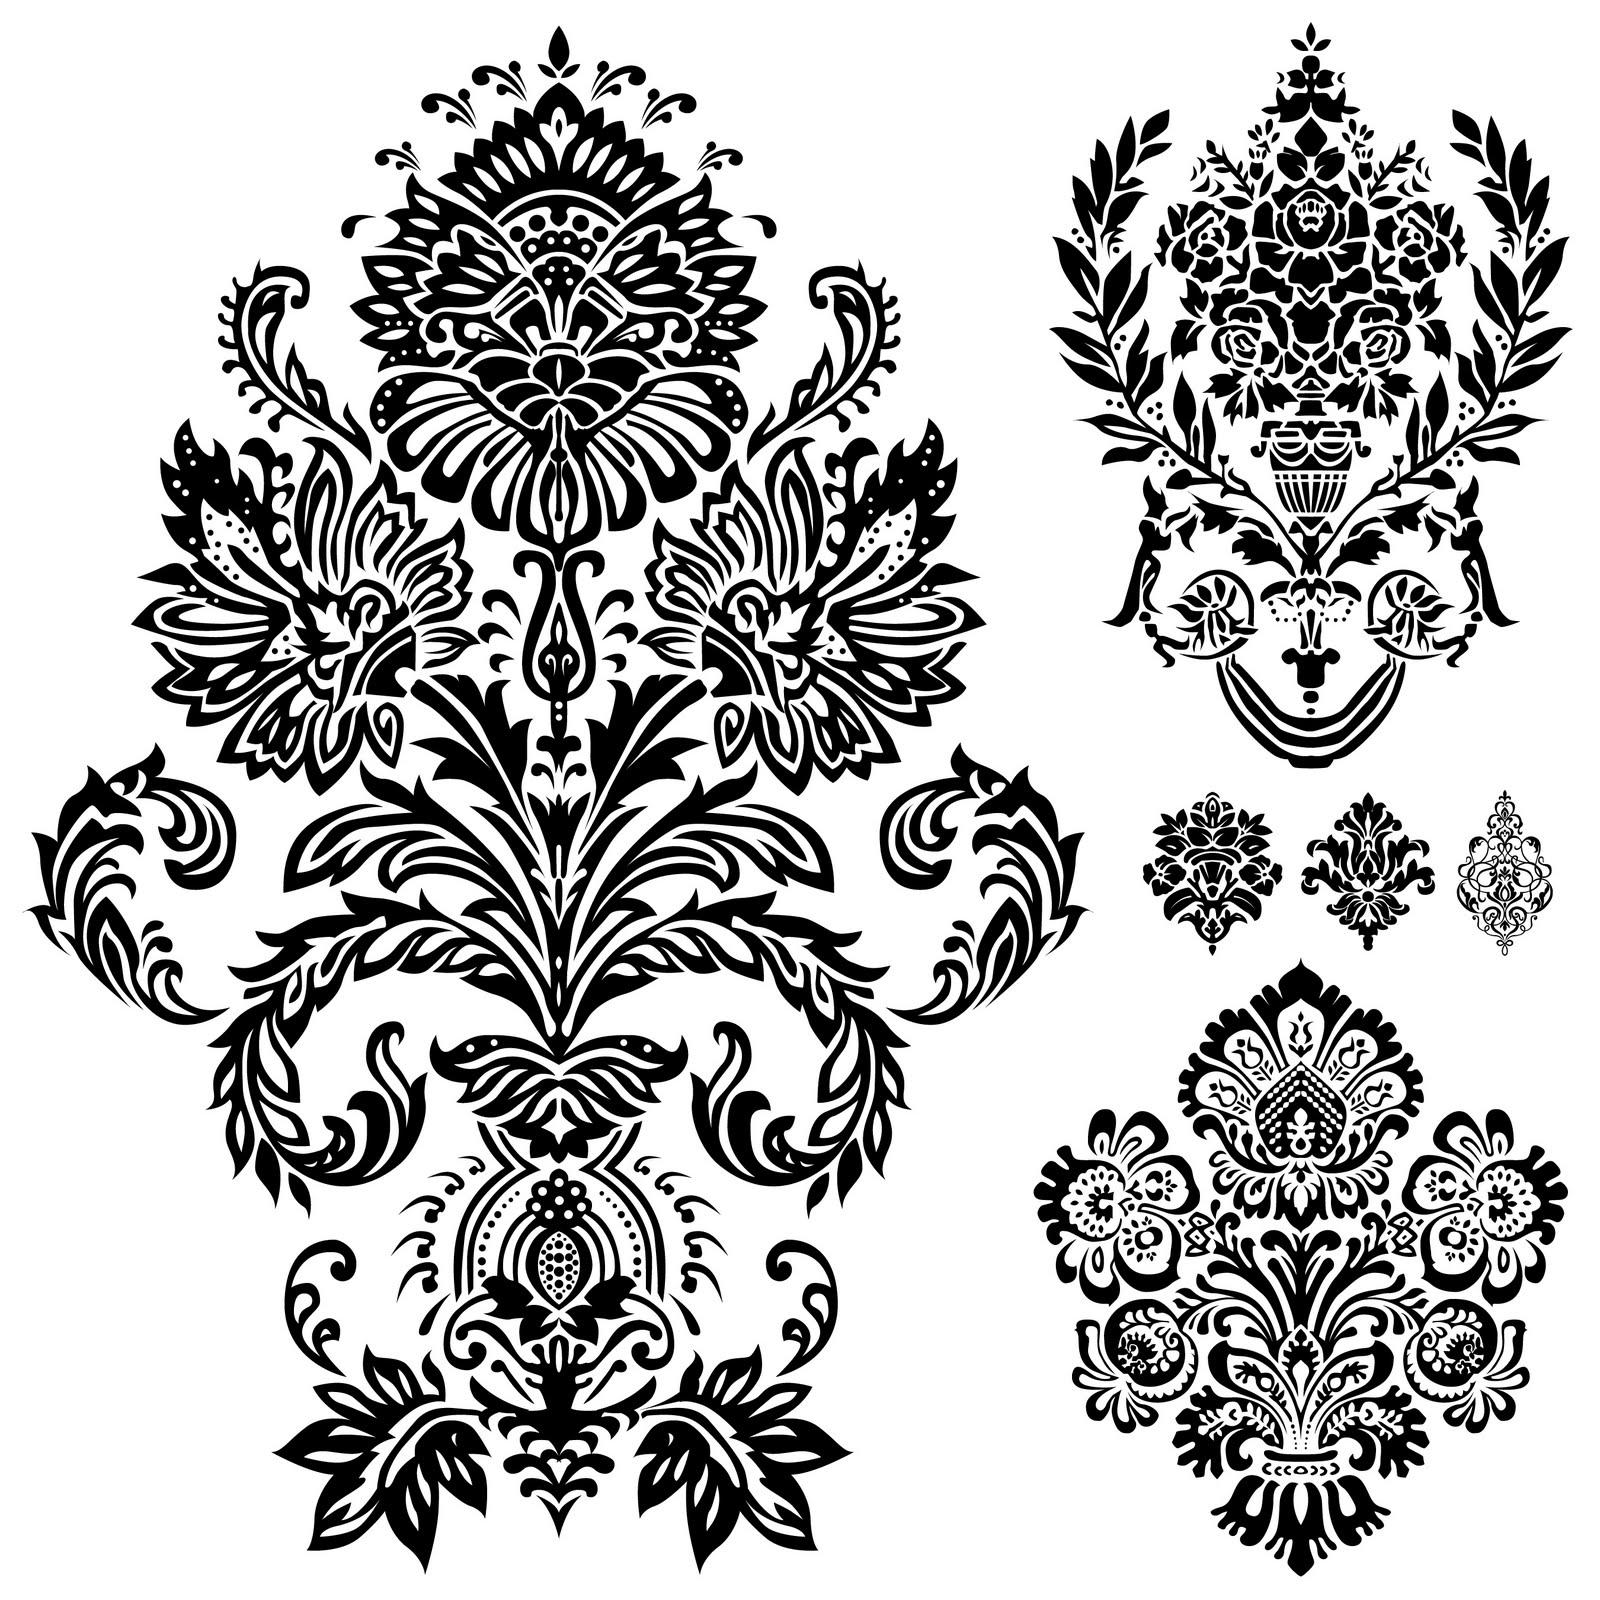 1600x1600 Shery K Designs Free Digi Stamps Flourish Ornaments Damask